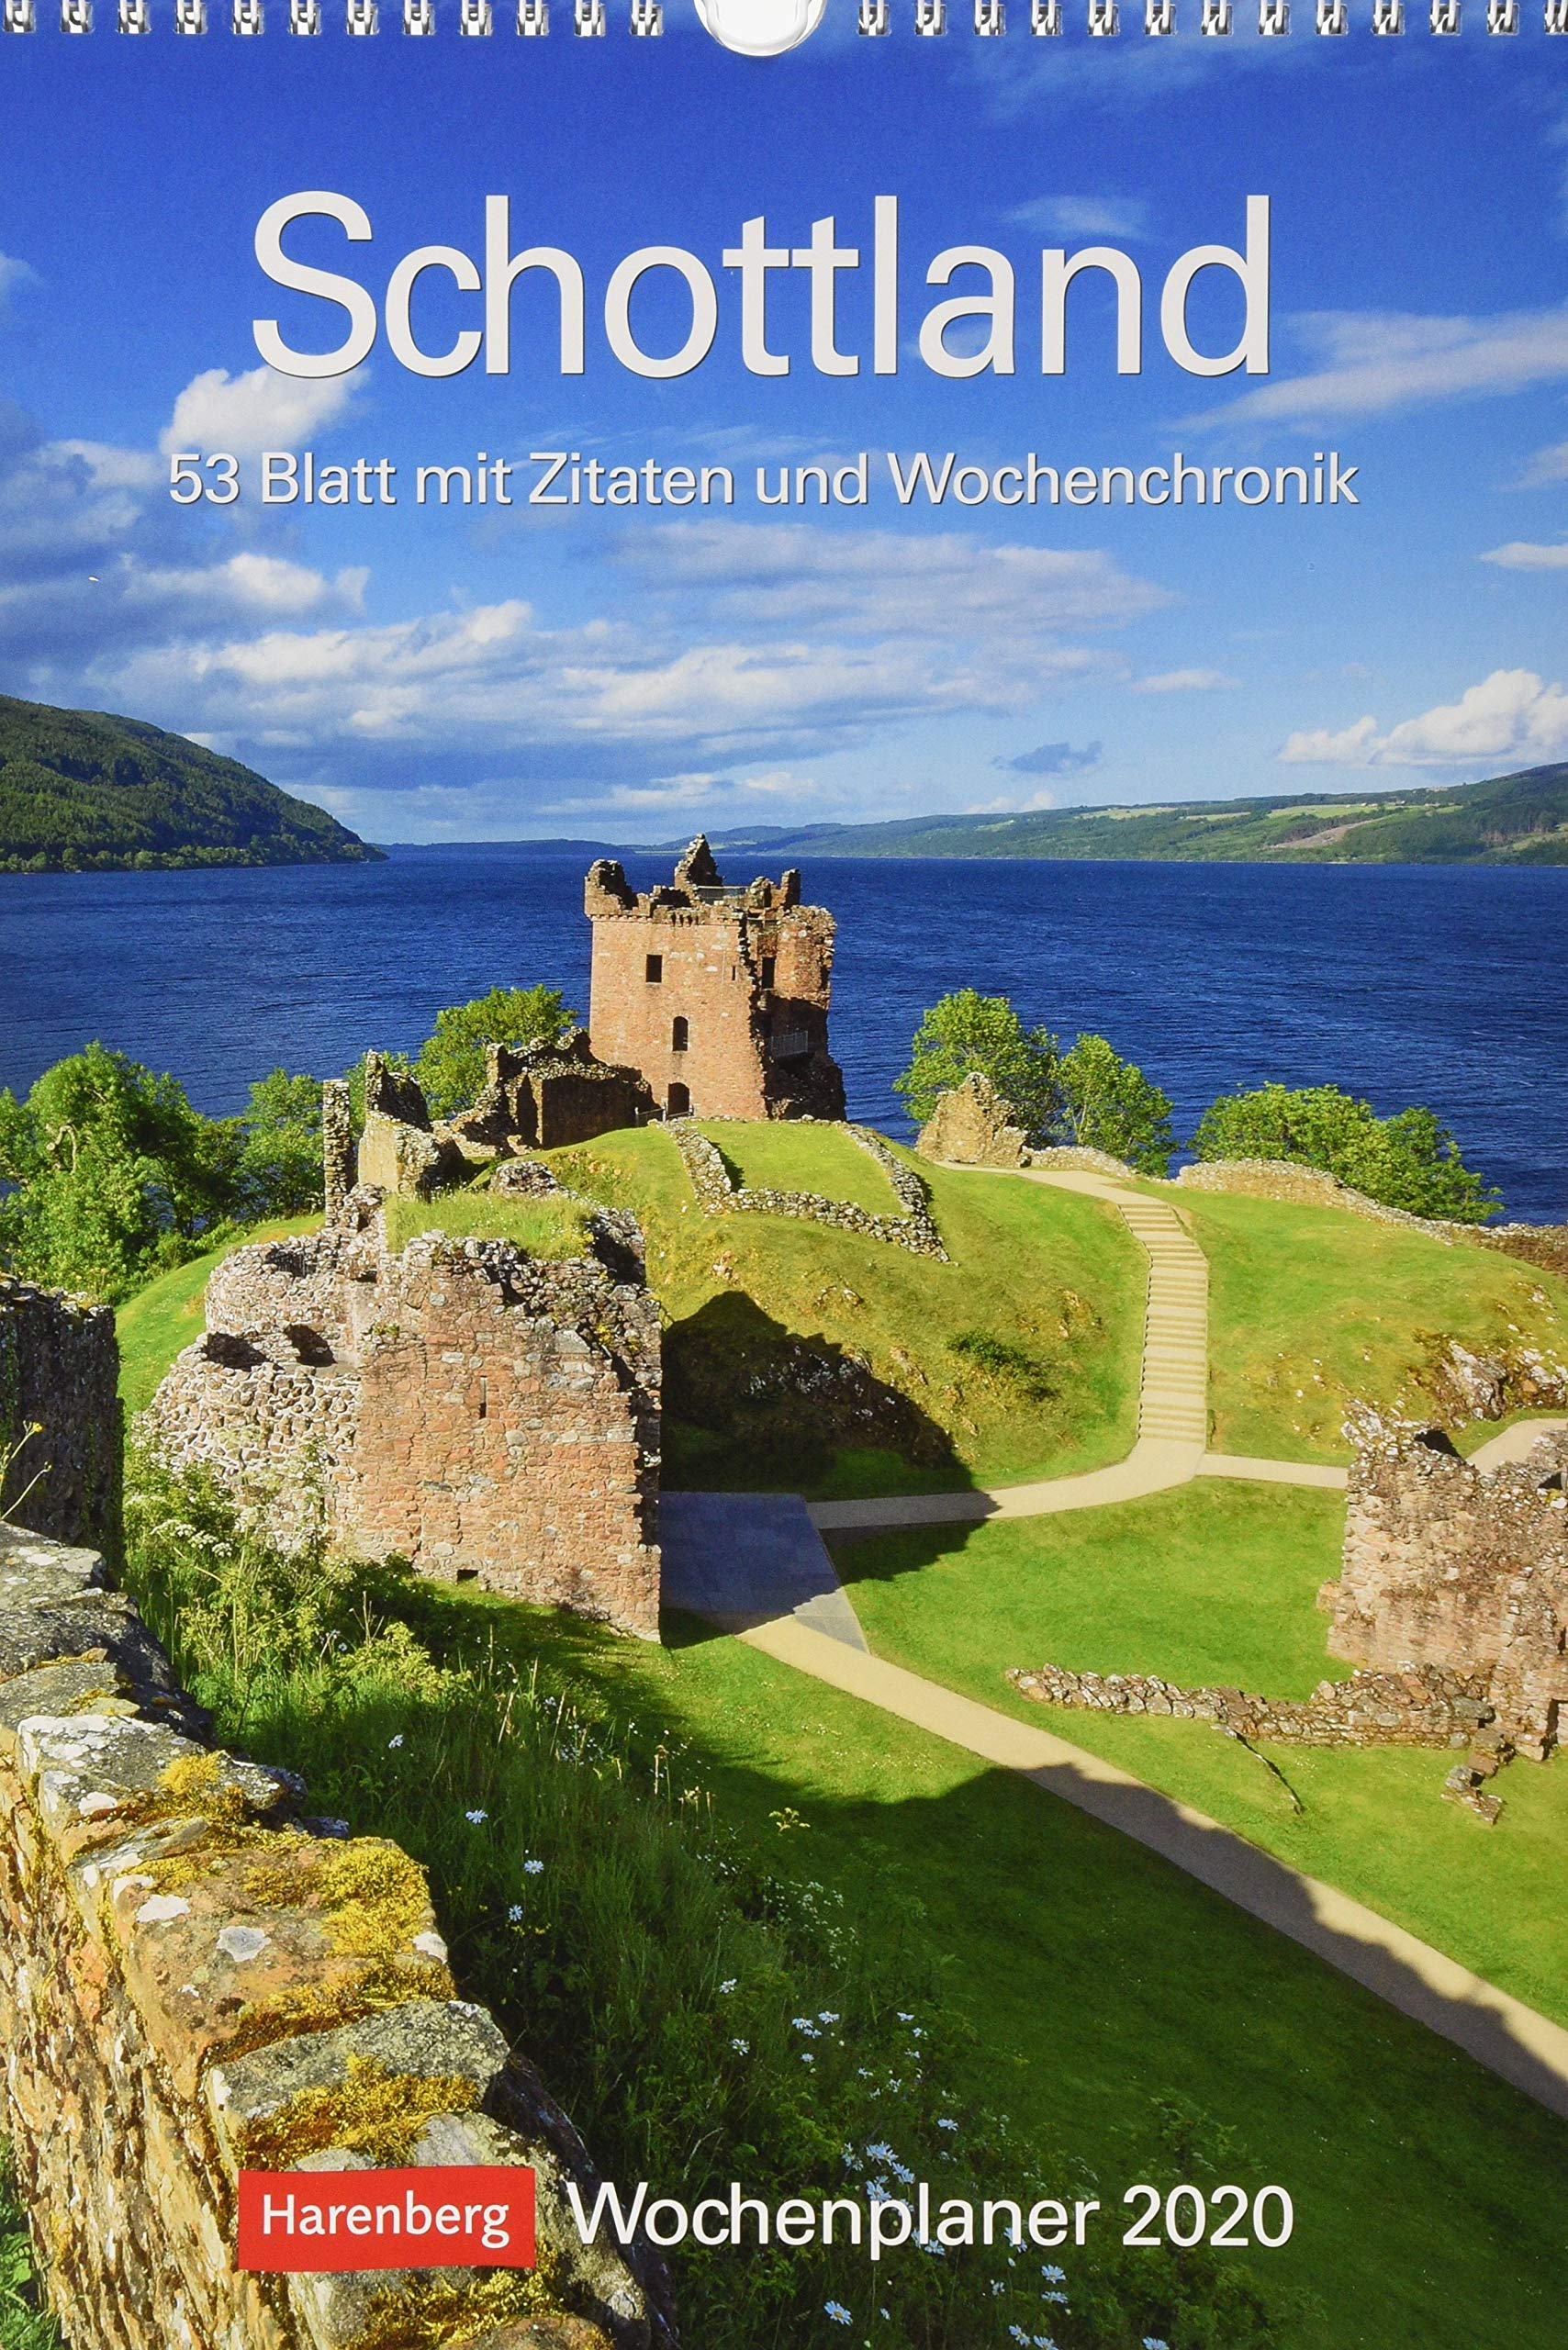 Schottland Wochenplaner. Wandkalender 2020. Wochenkalendarium. Spiralbindung. Format 25 X 355 Cm